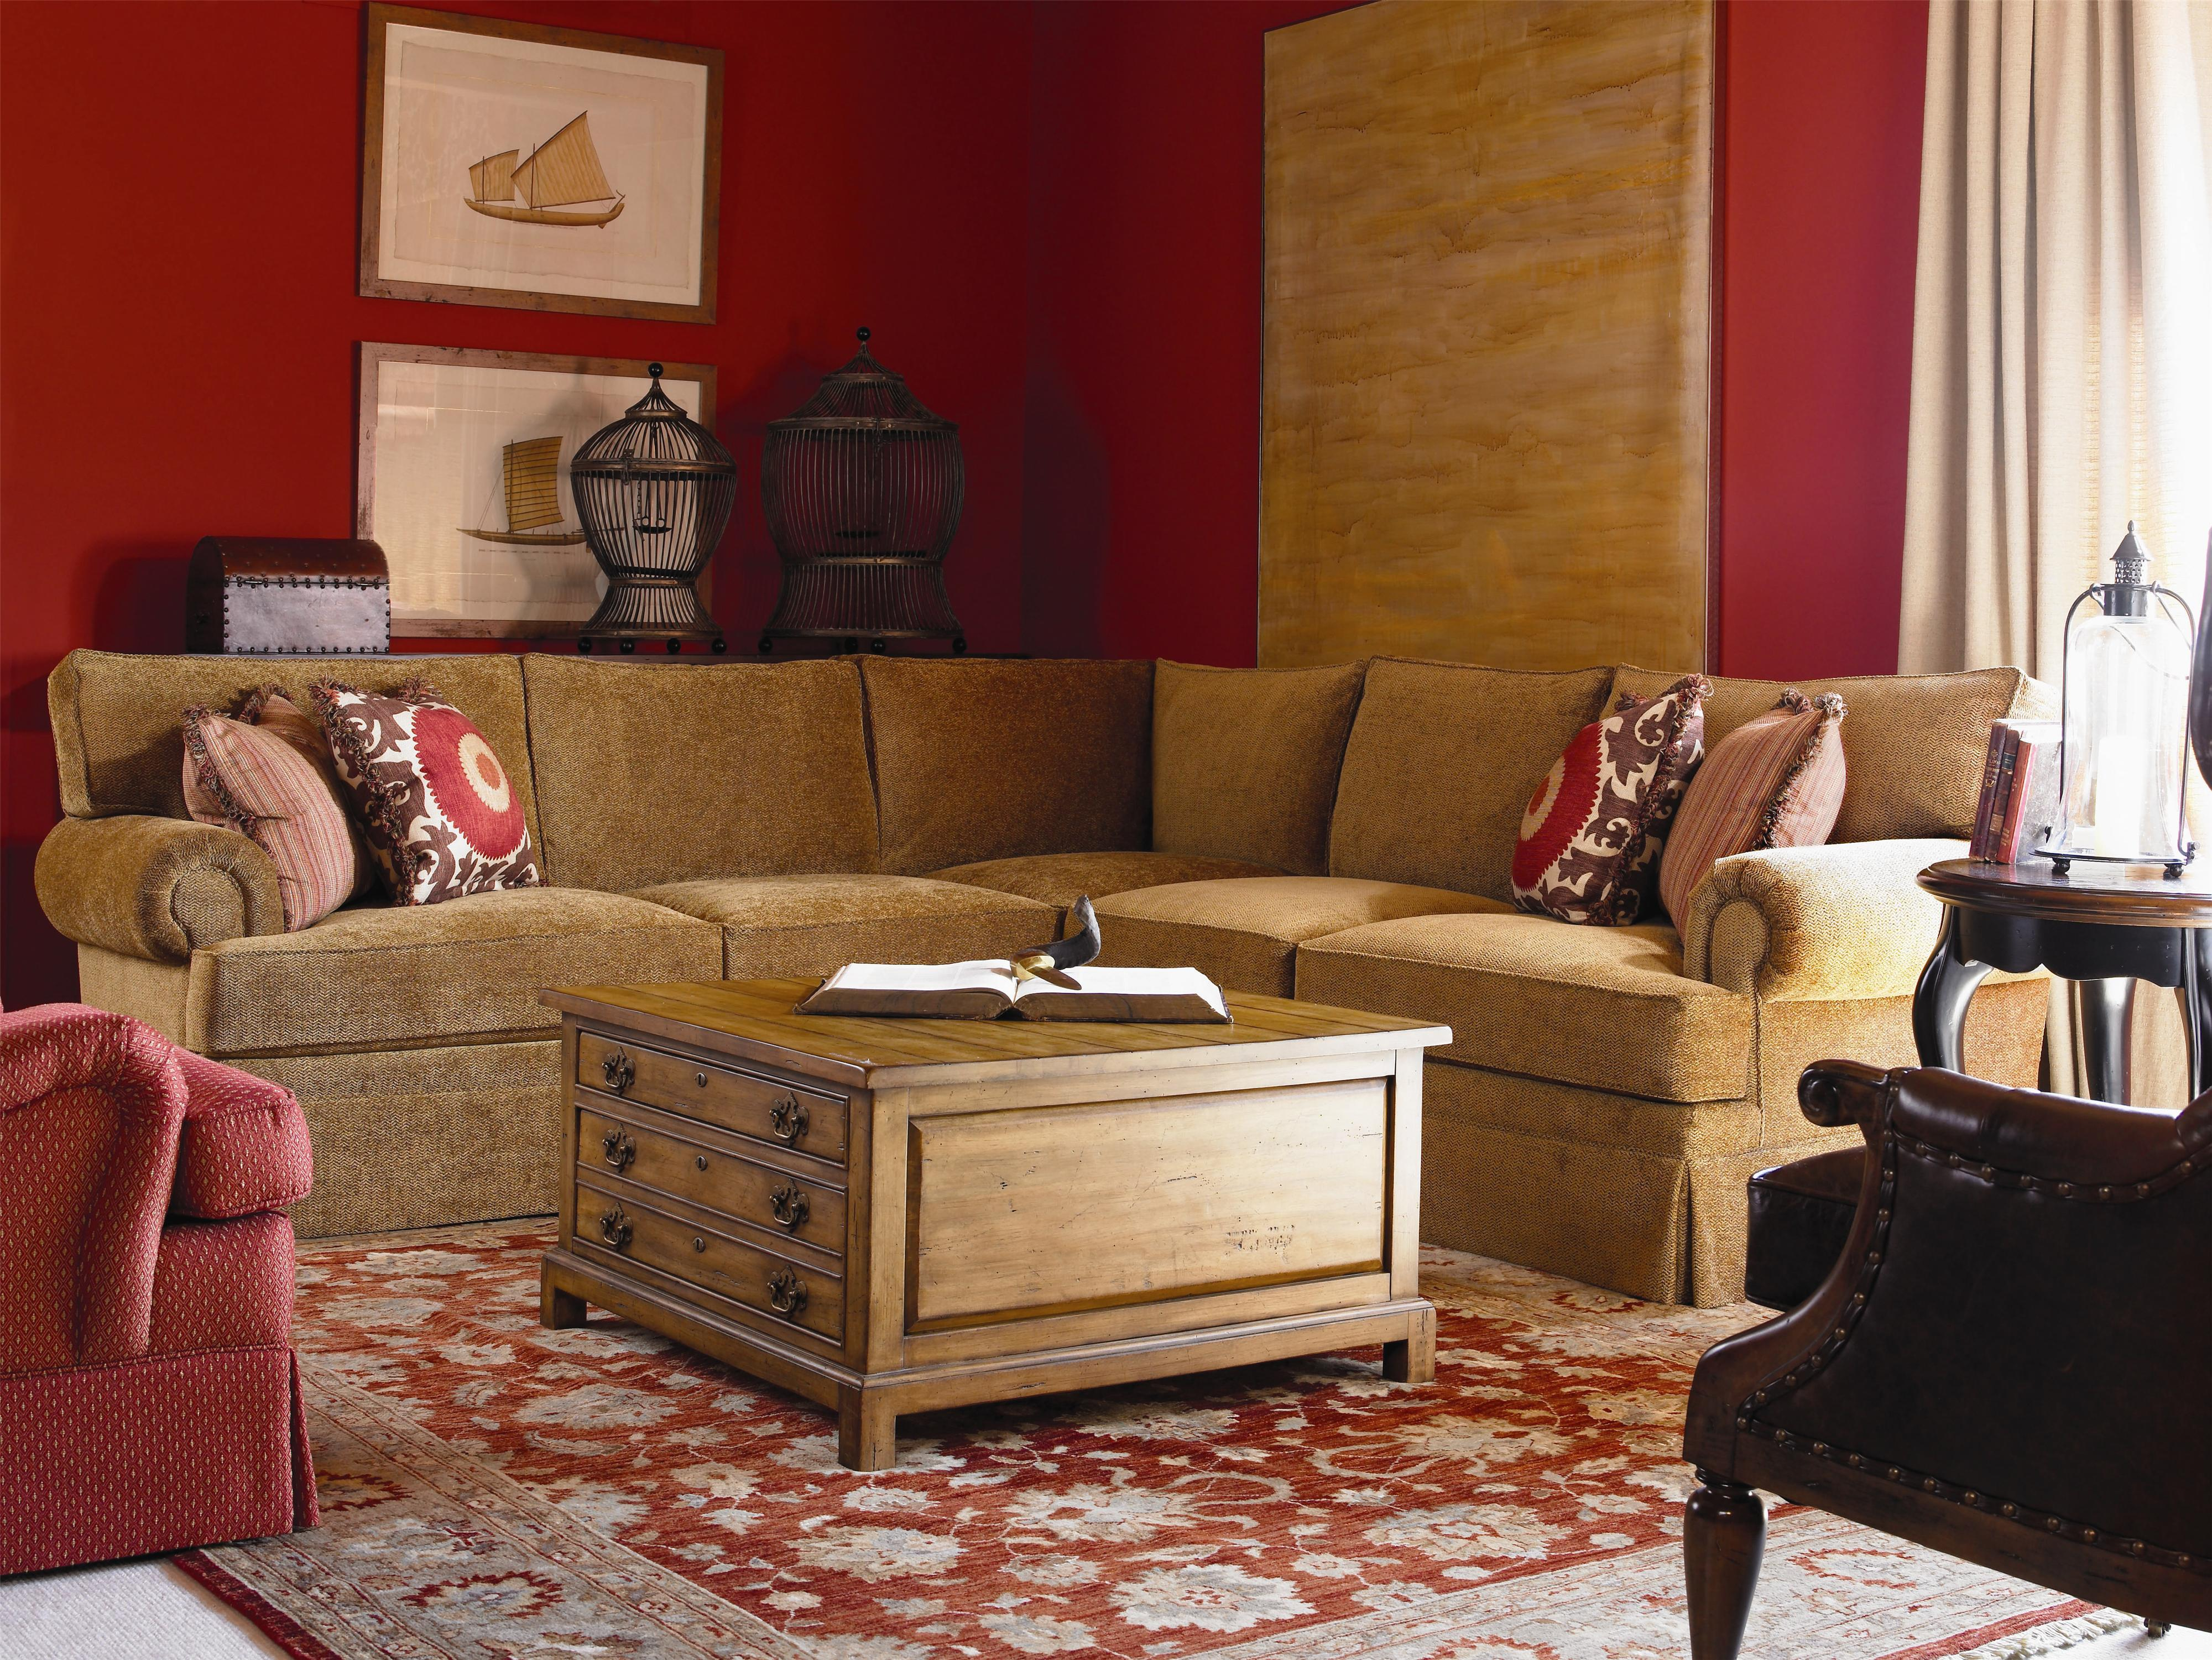 Cornerstone  <b>Customizable</b> Sectional Sofa by Century at Baer's Furniture